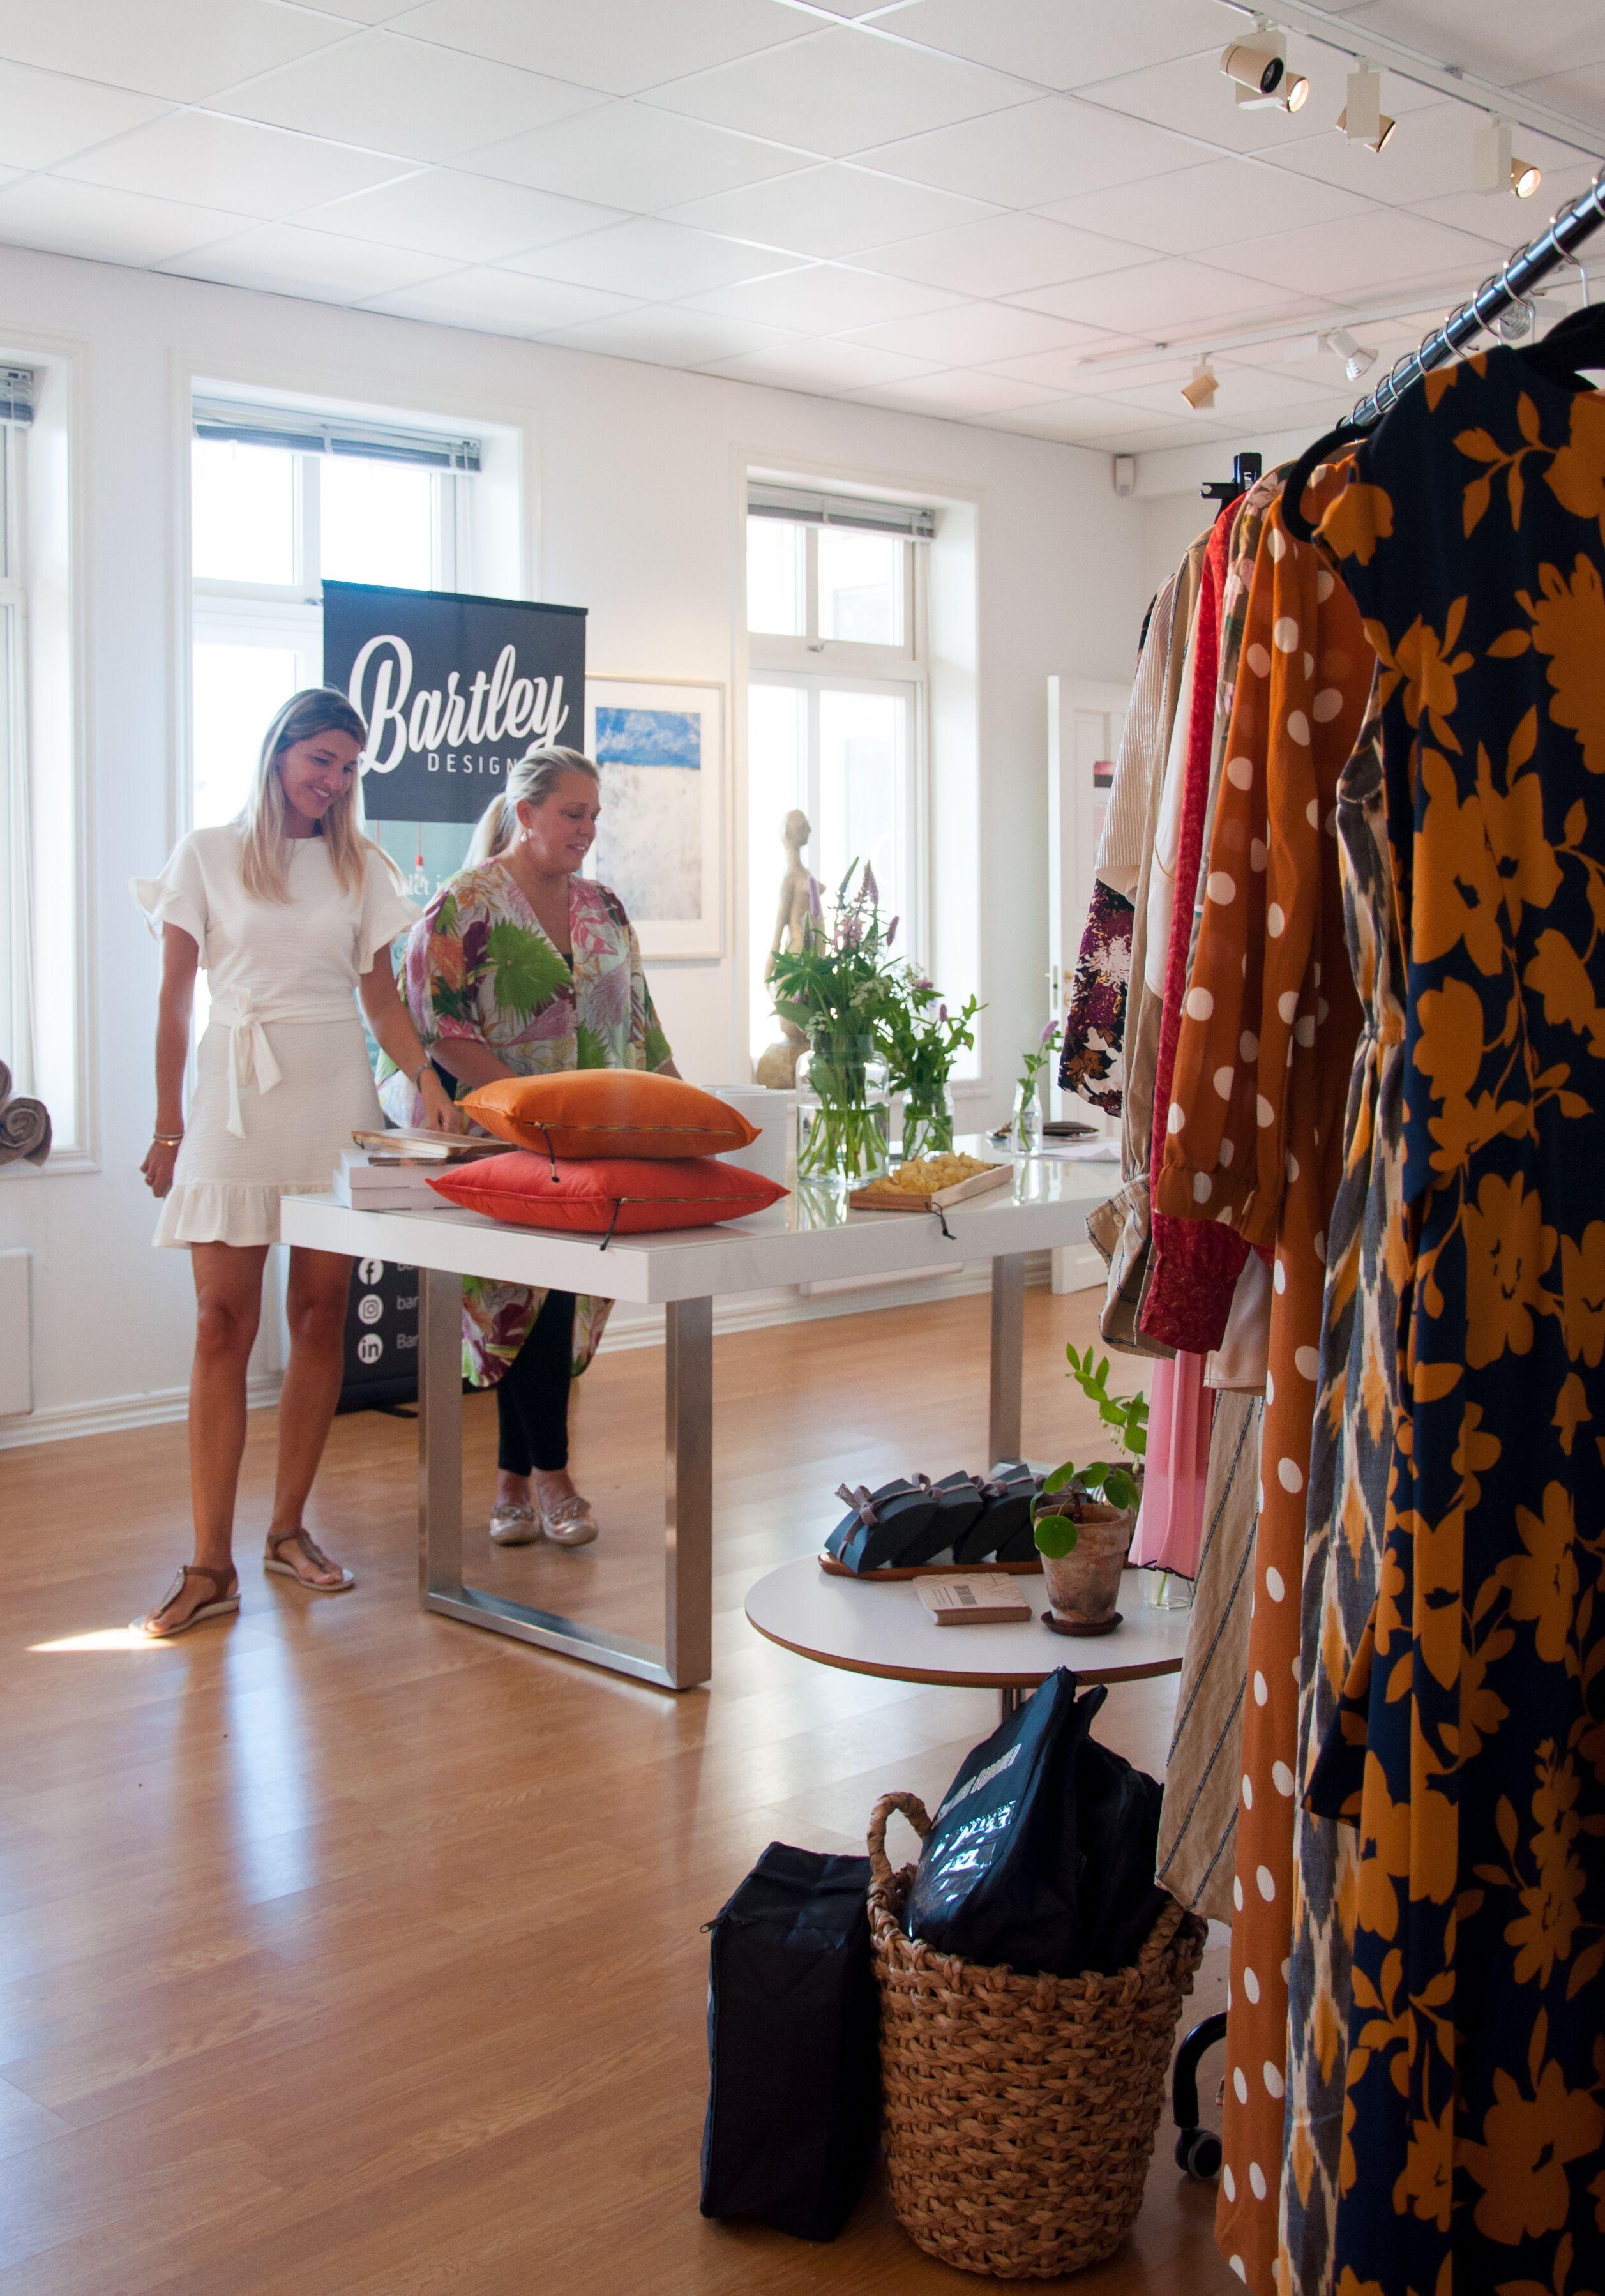 Mille W Nordisk Design, Ulrika Sohtell - det kvinnliga nätverket Studio25. Foto: Leonor Juhl K